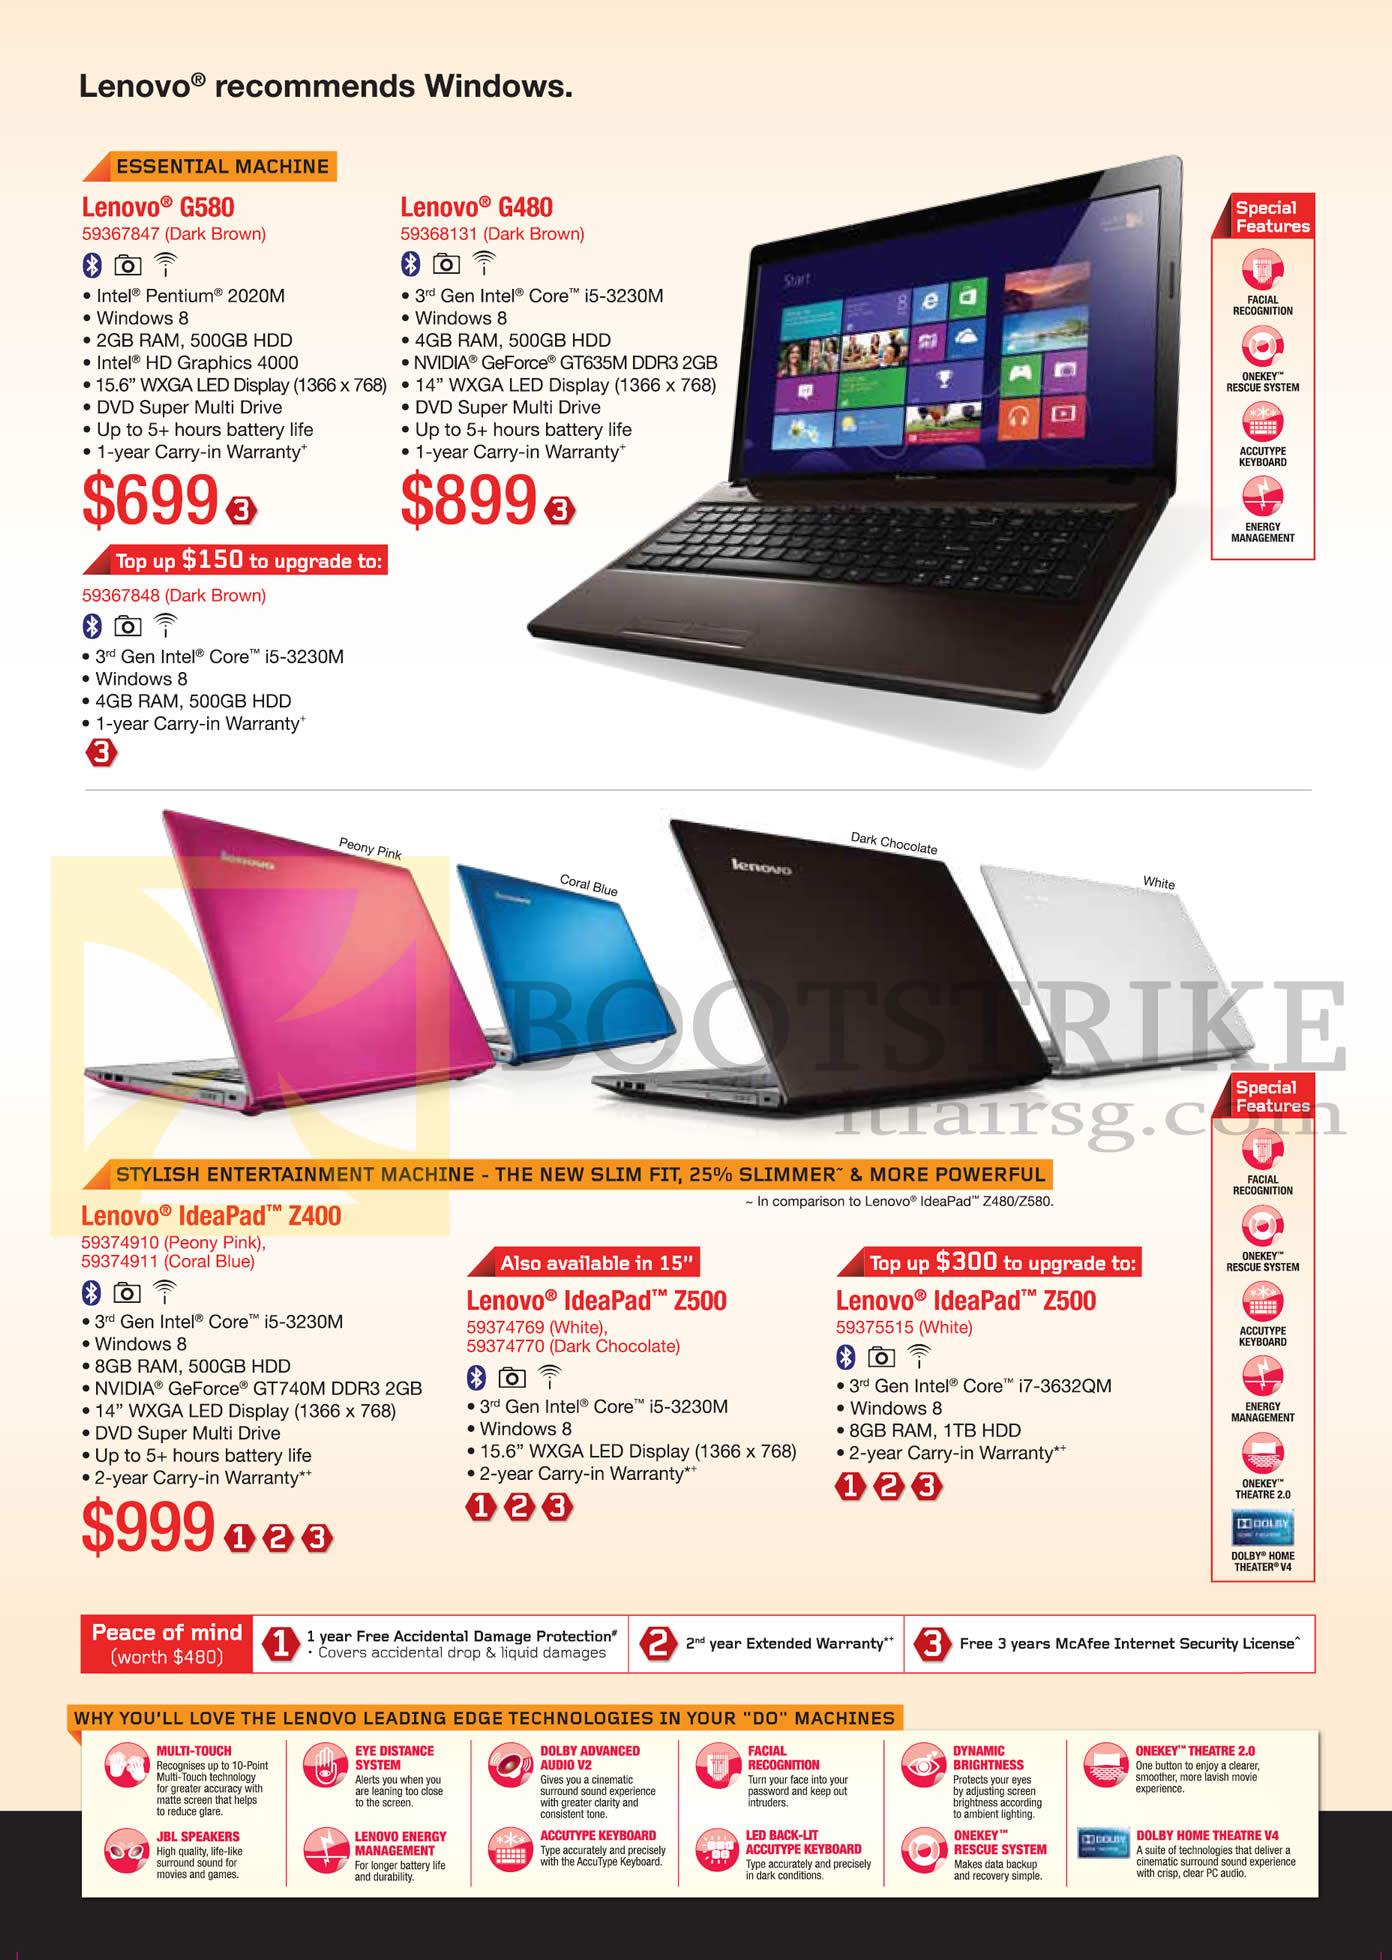 PC SHOW 2013 price list image brochure of Lenovo Notebooks G580, G480, Ideapad Z400, Z500